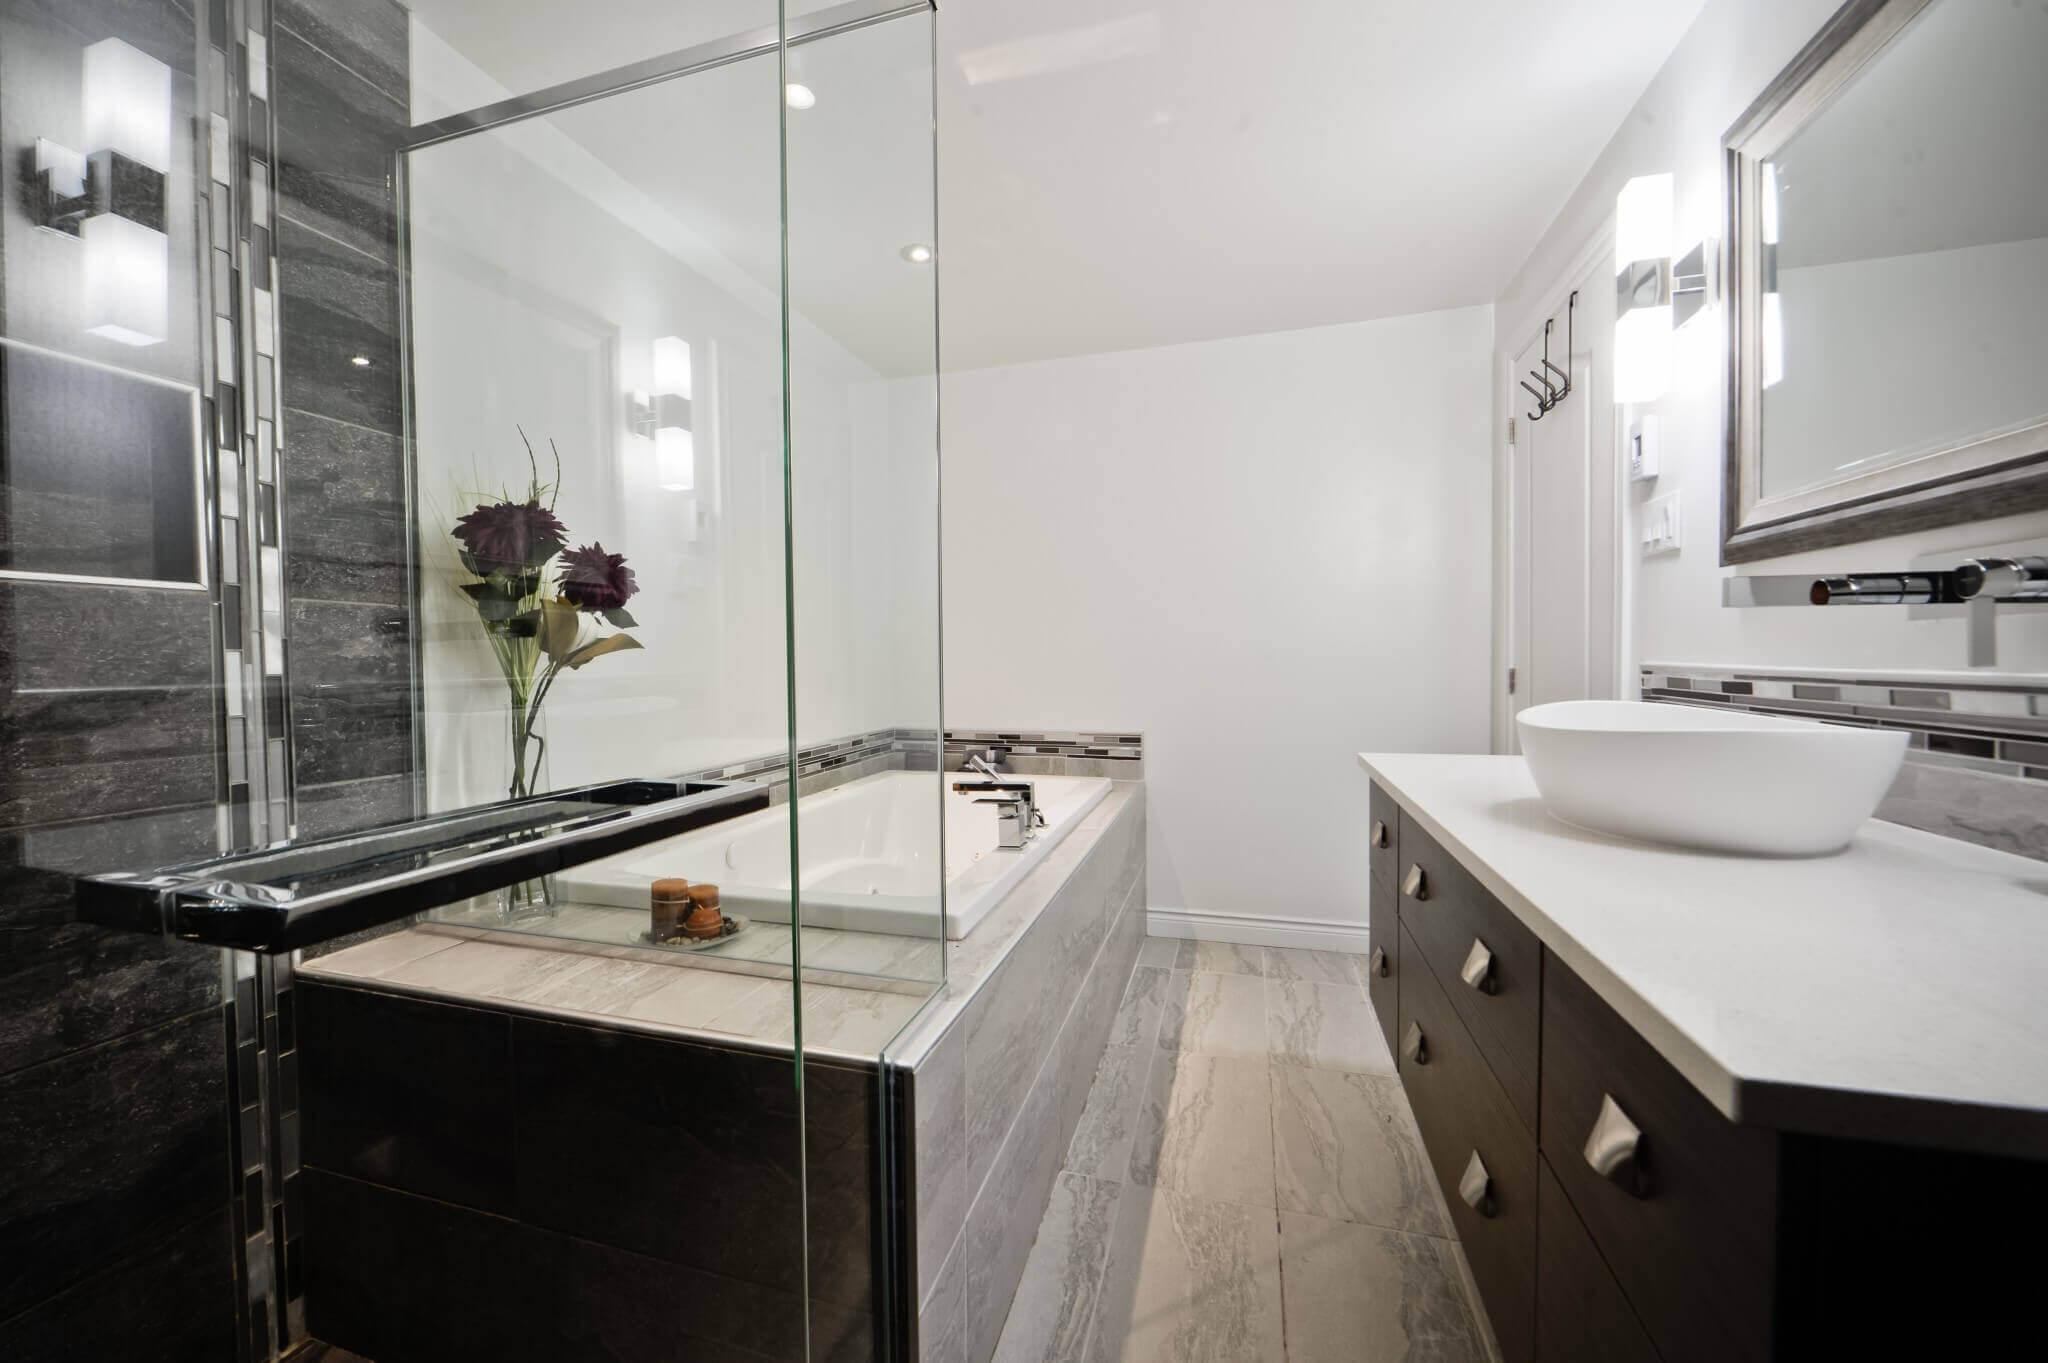 rénovation de salle de bain moderne